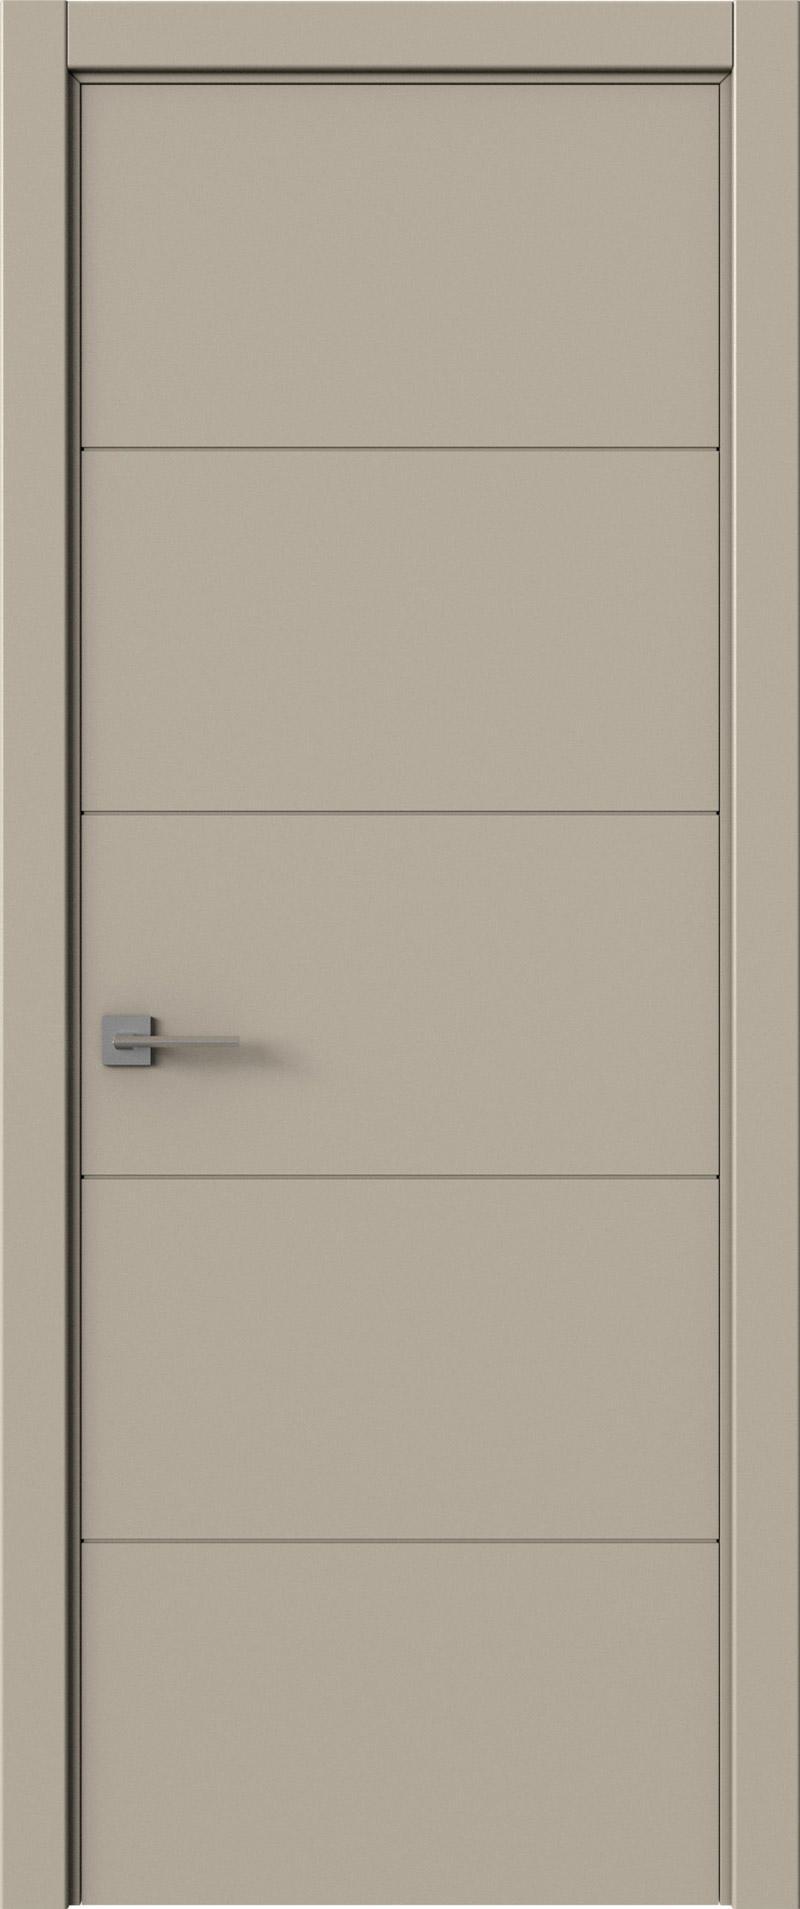 Tivoli Д-2 цвет - Серо-оливковая эмаль (RAL 7032) Без стекла (ДГ)